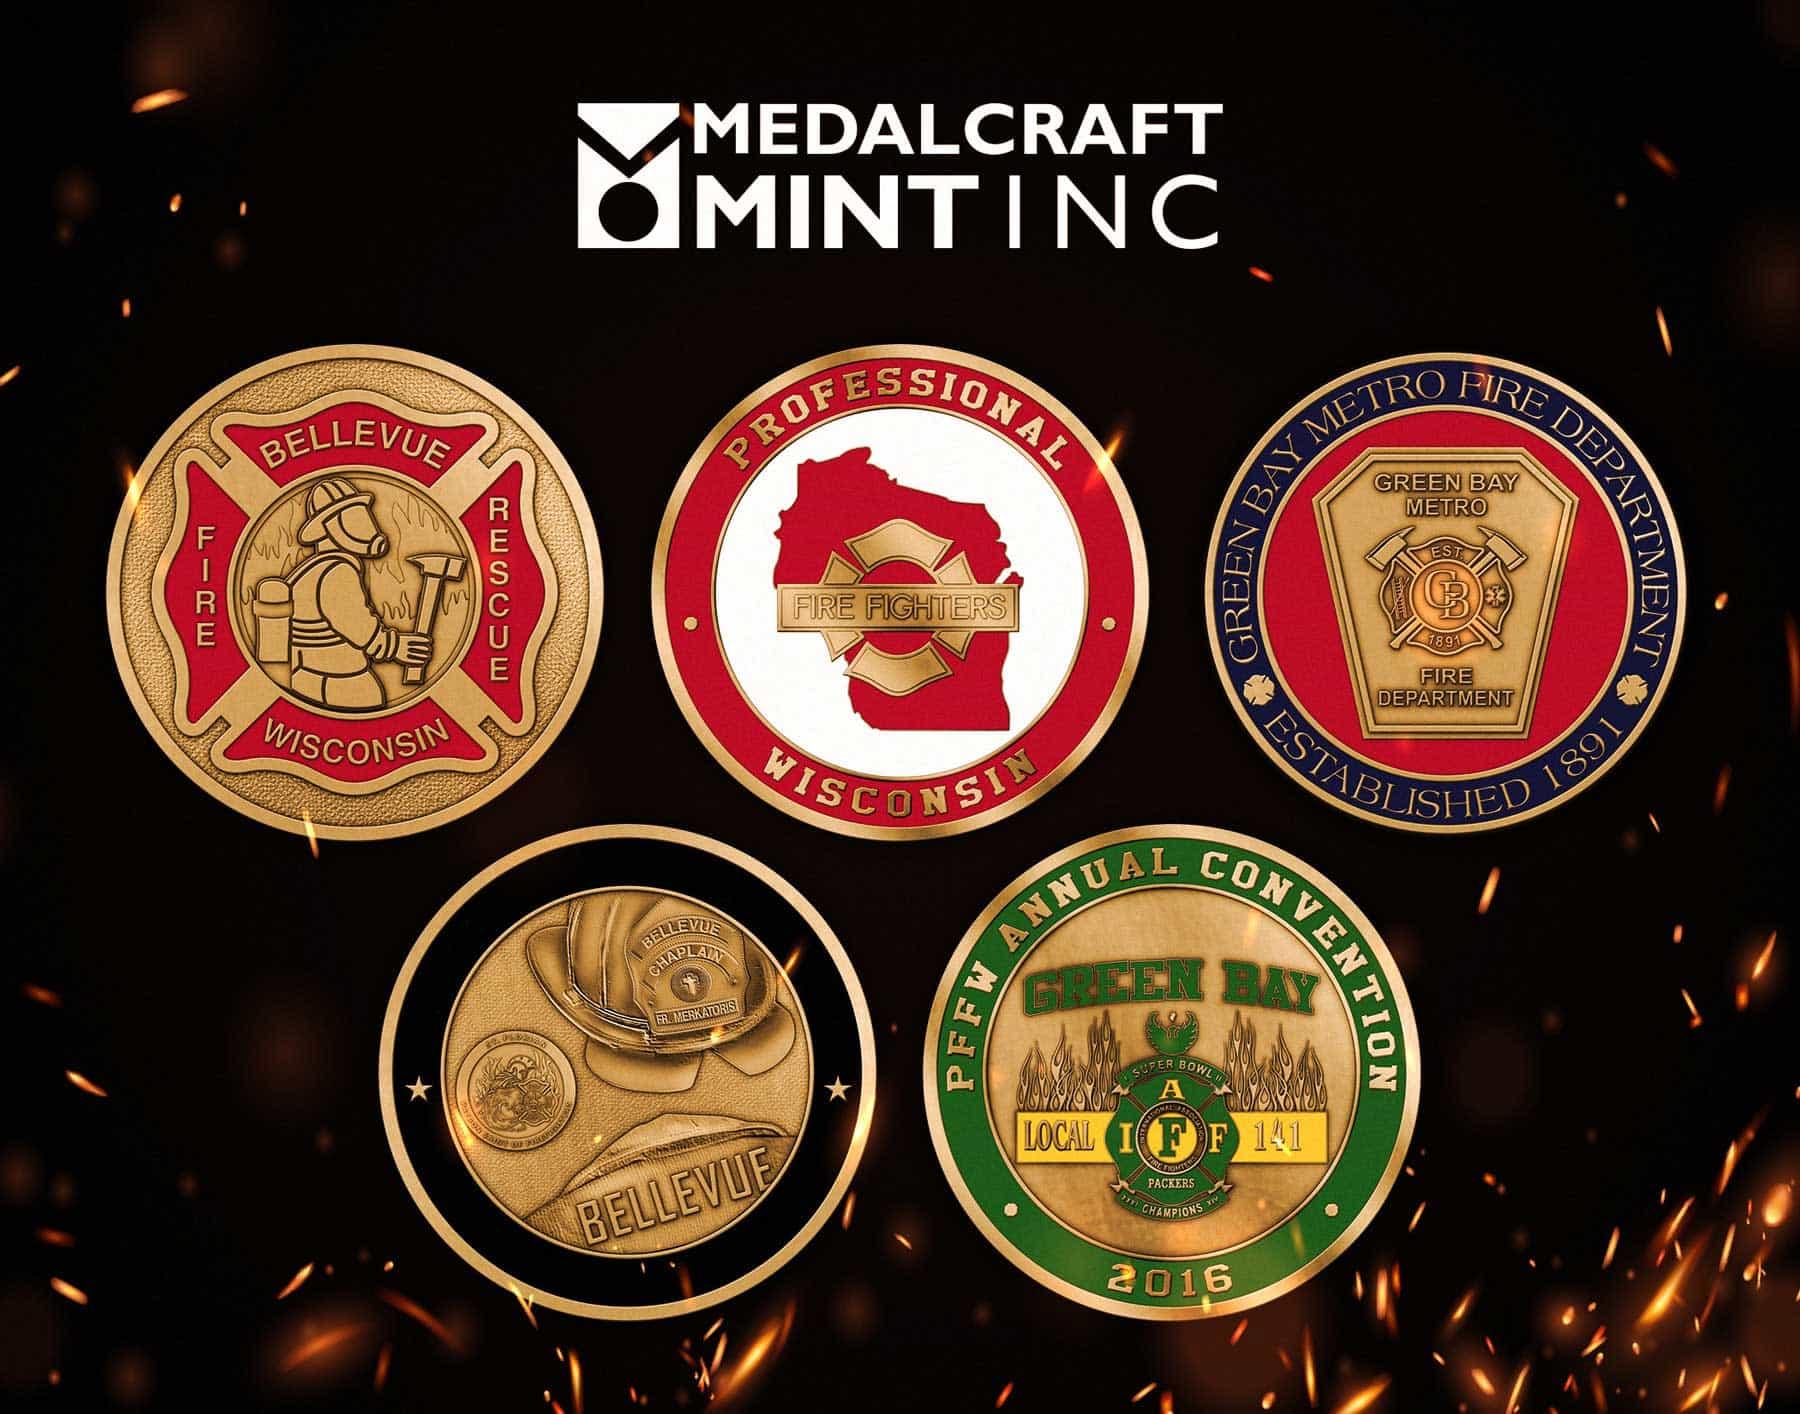 Medalcraft Mint Firefighter challenge coins